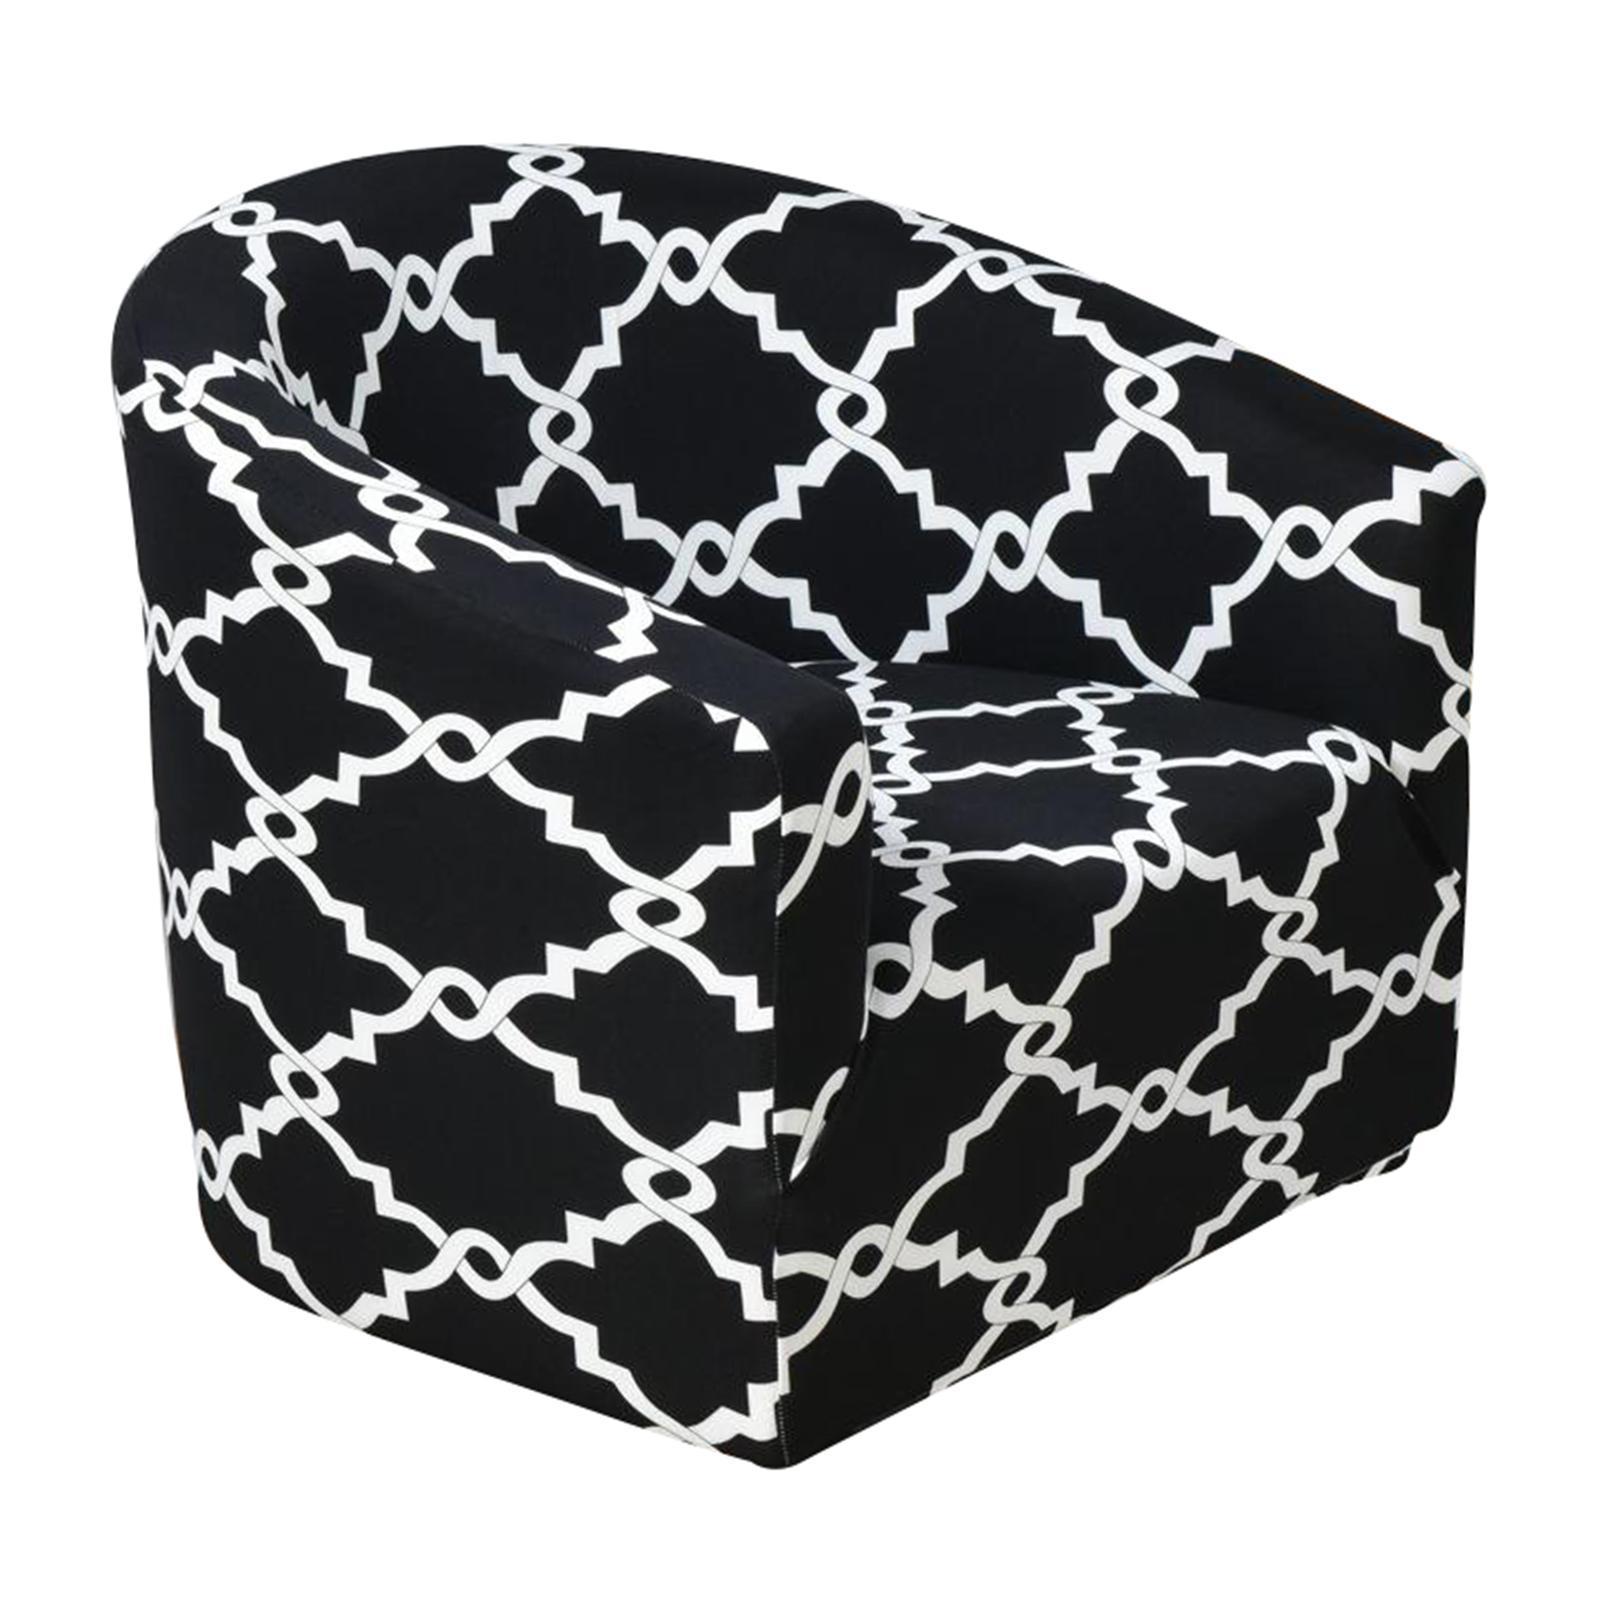 miniatura 3 - Fodera per poltrona singola per poltrona Fodera per sedia in colori assortiti